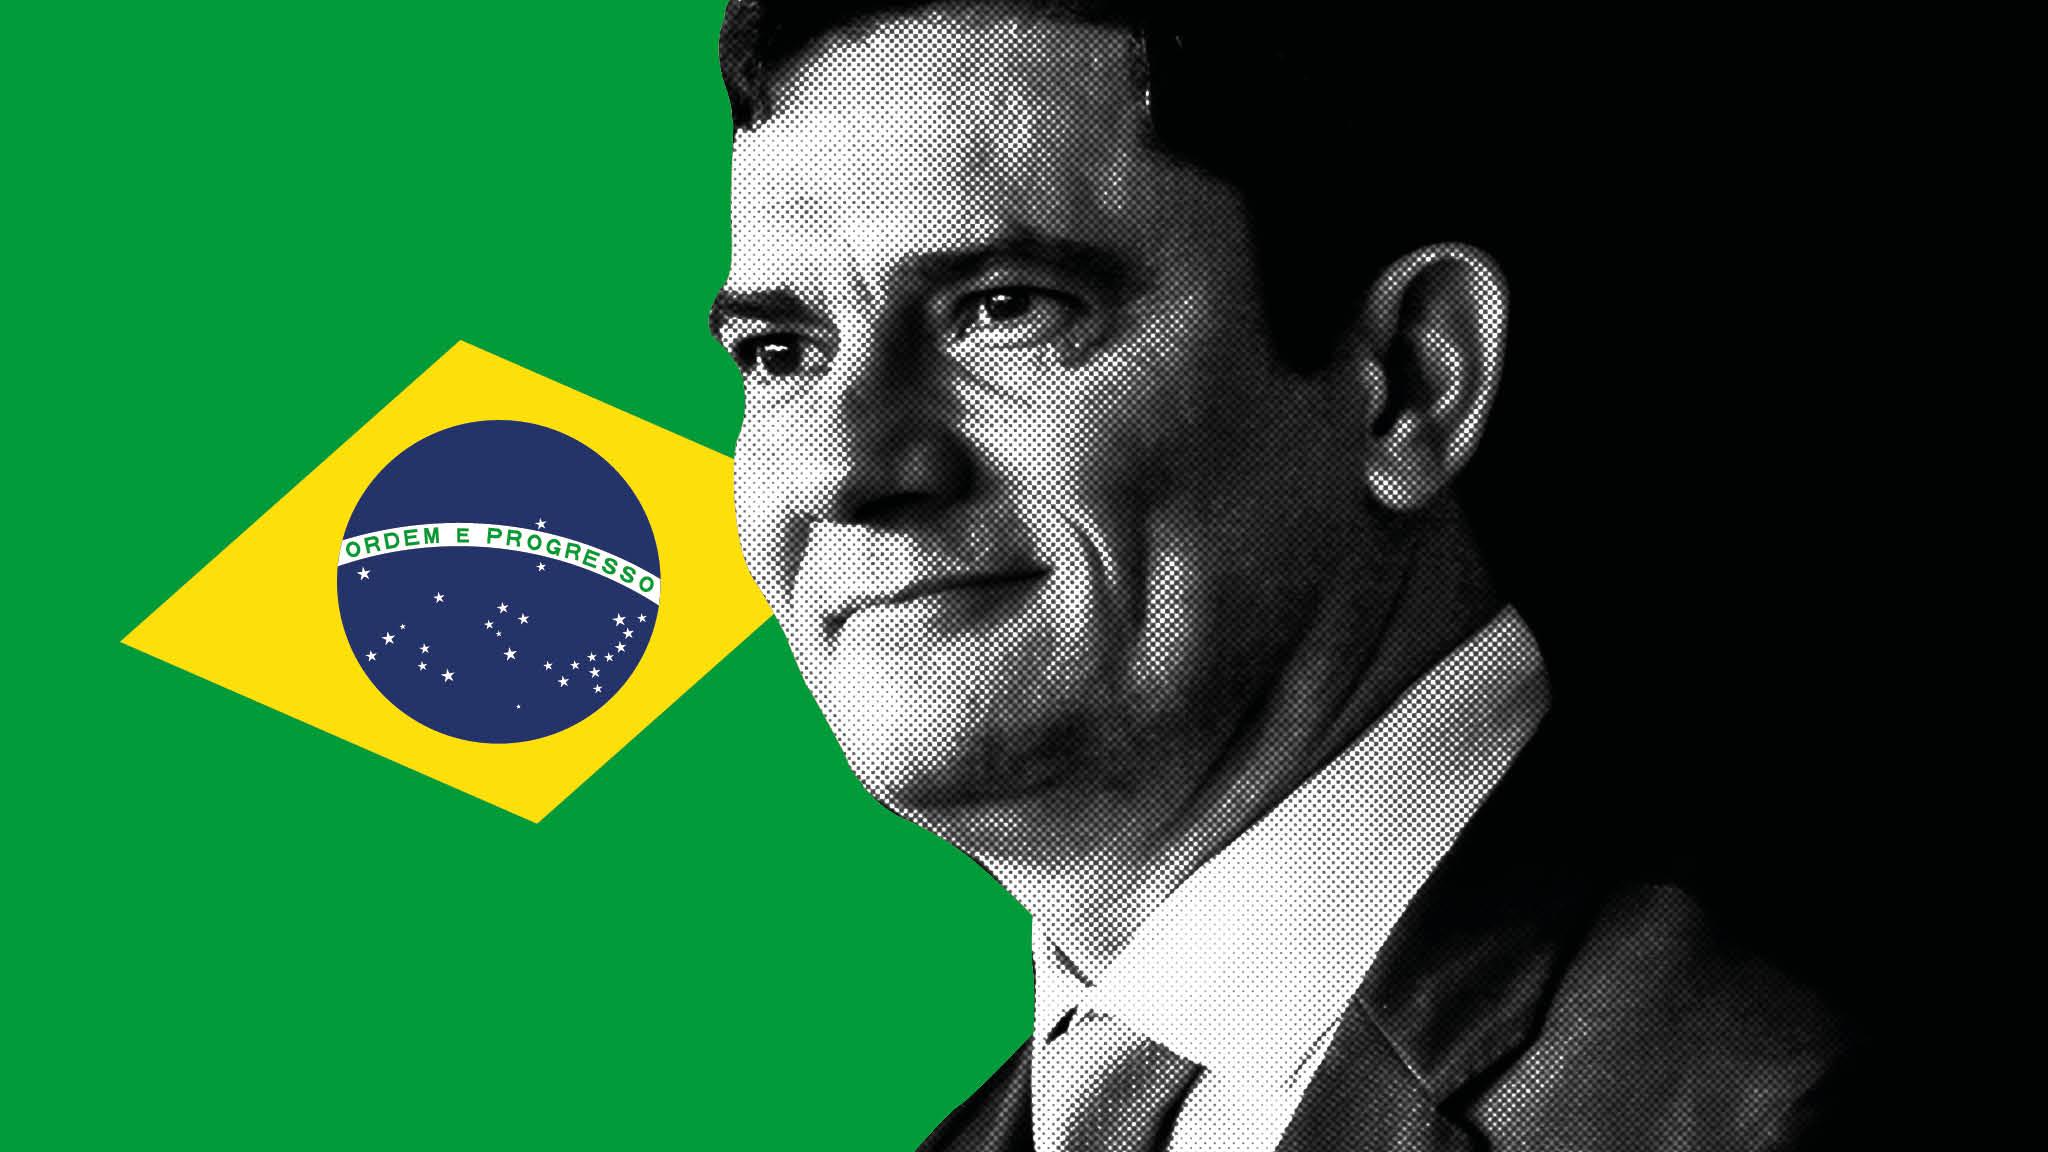 Latin America: Brazil's anti-corruption drive faces a backlash